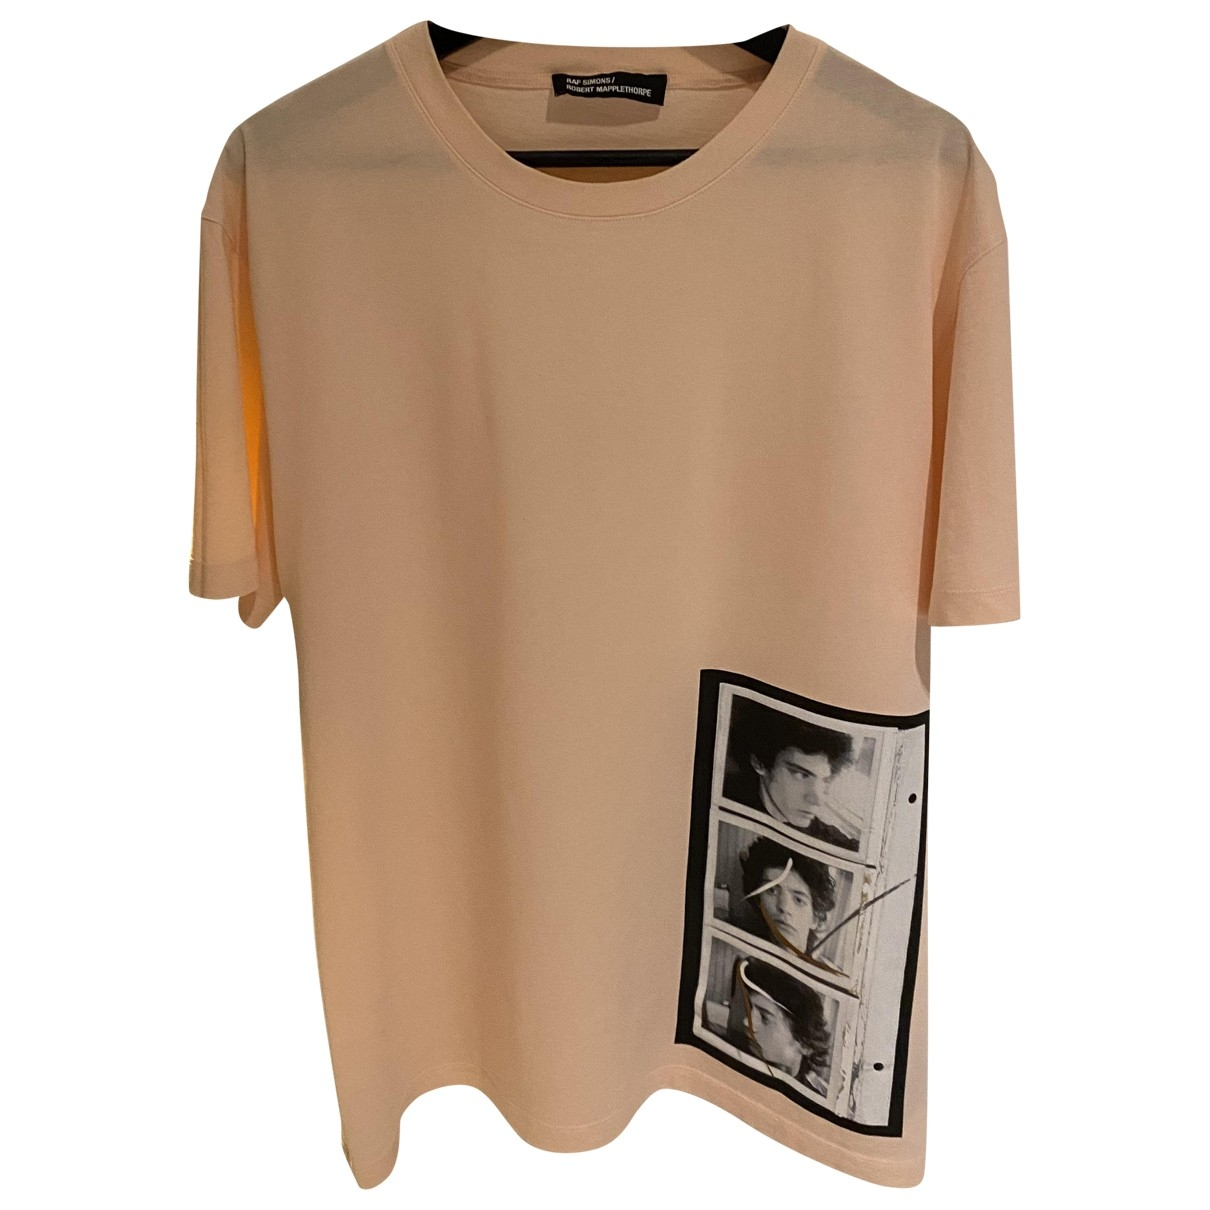 Raf Simons - Tee shirts   pour homme en coton - rose